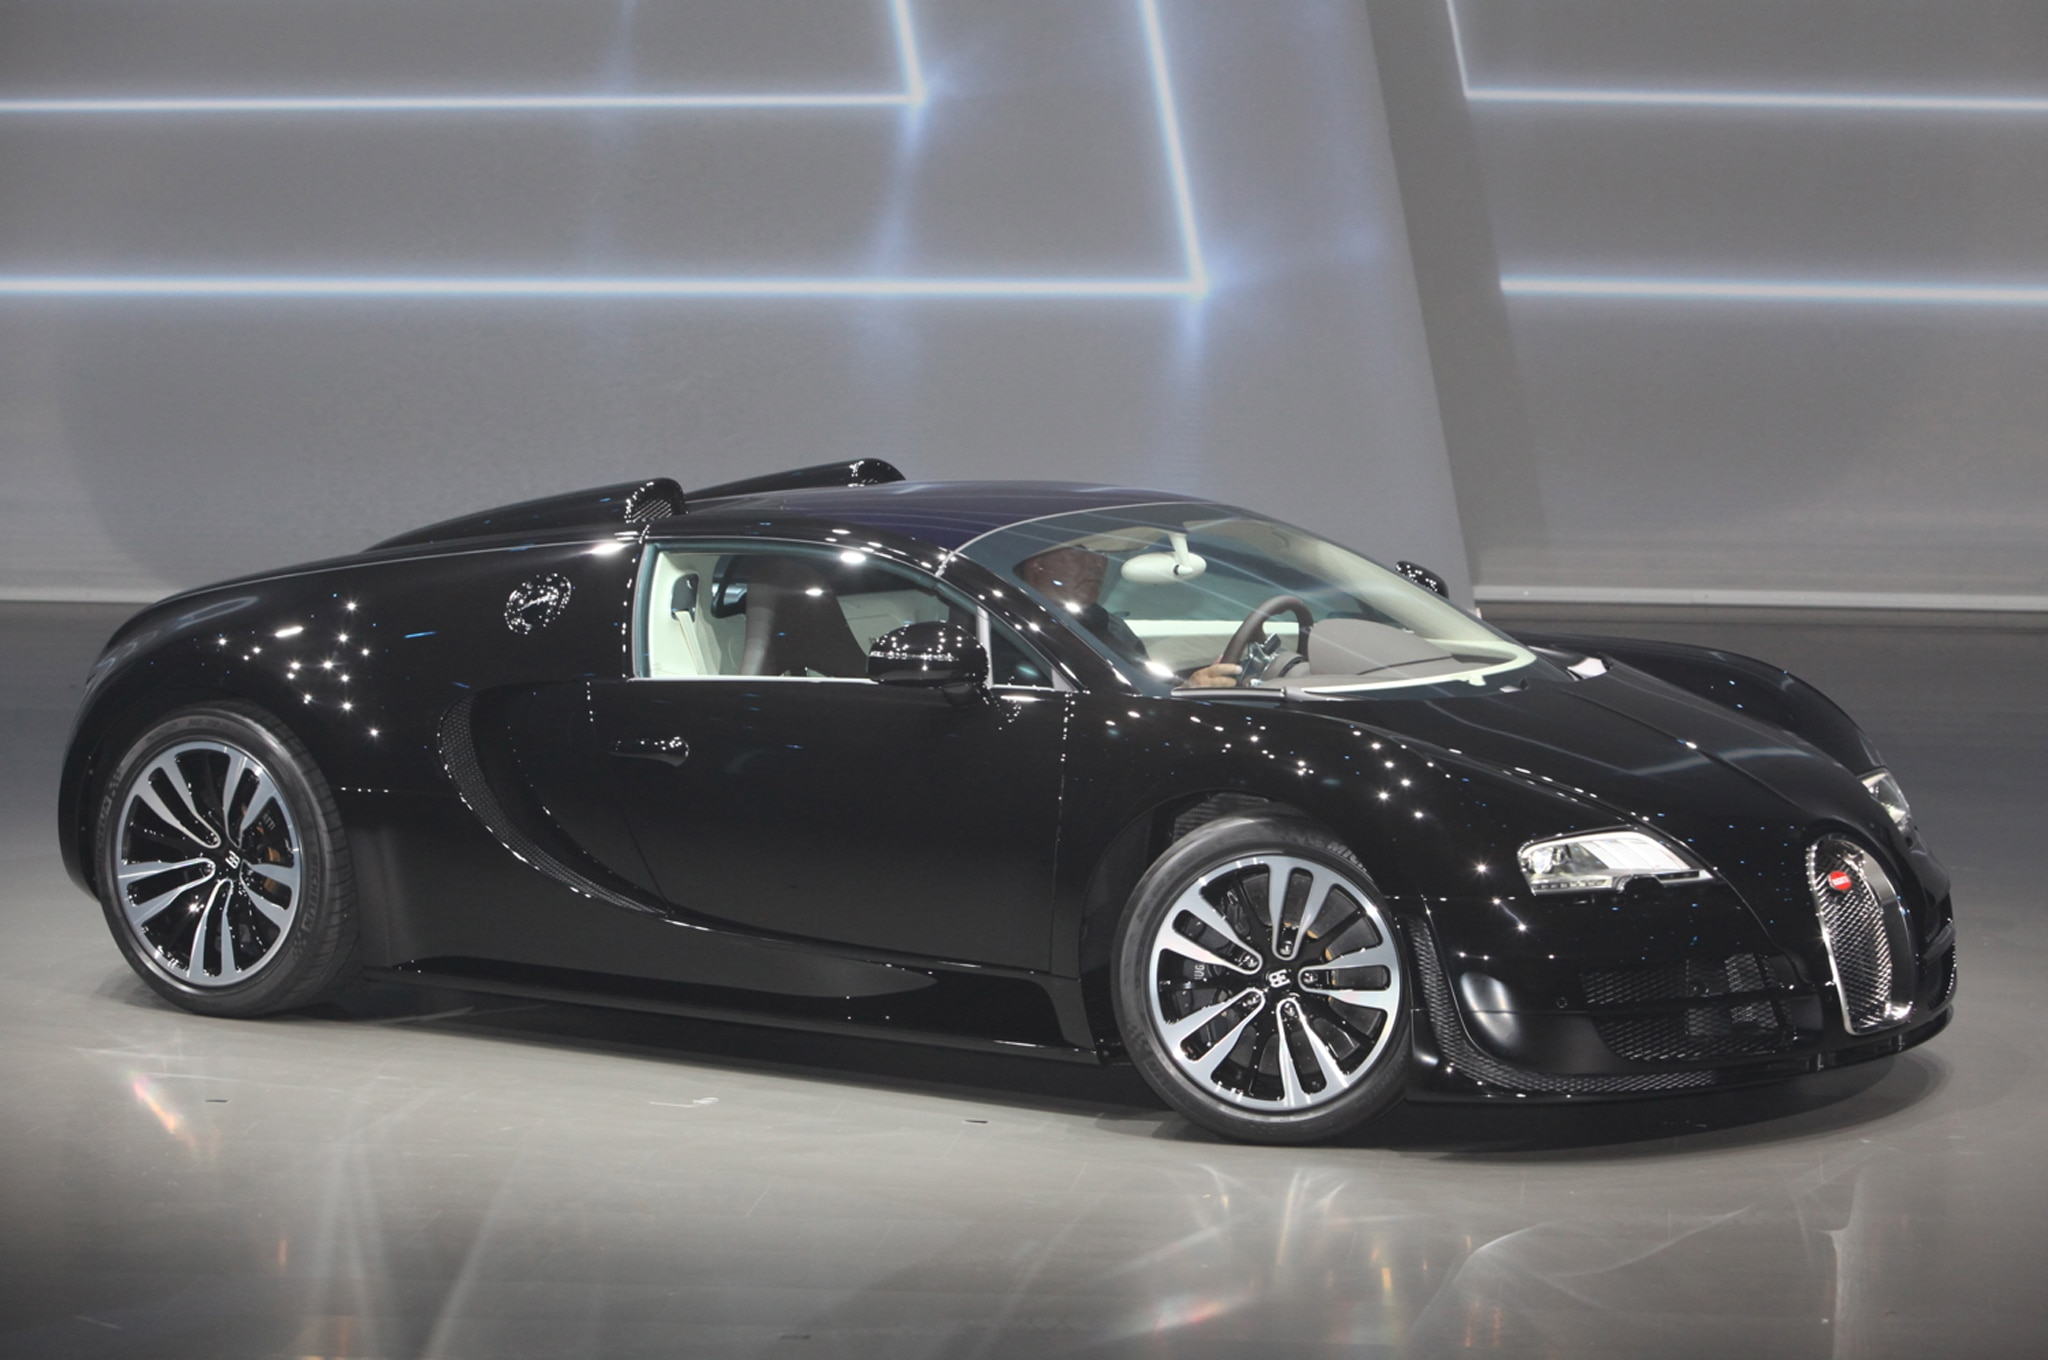 2013 bugatti veyron jean bugatti legend edition first look. Black Bedroom Furniture Sets. Home Design Ideas